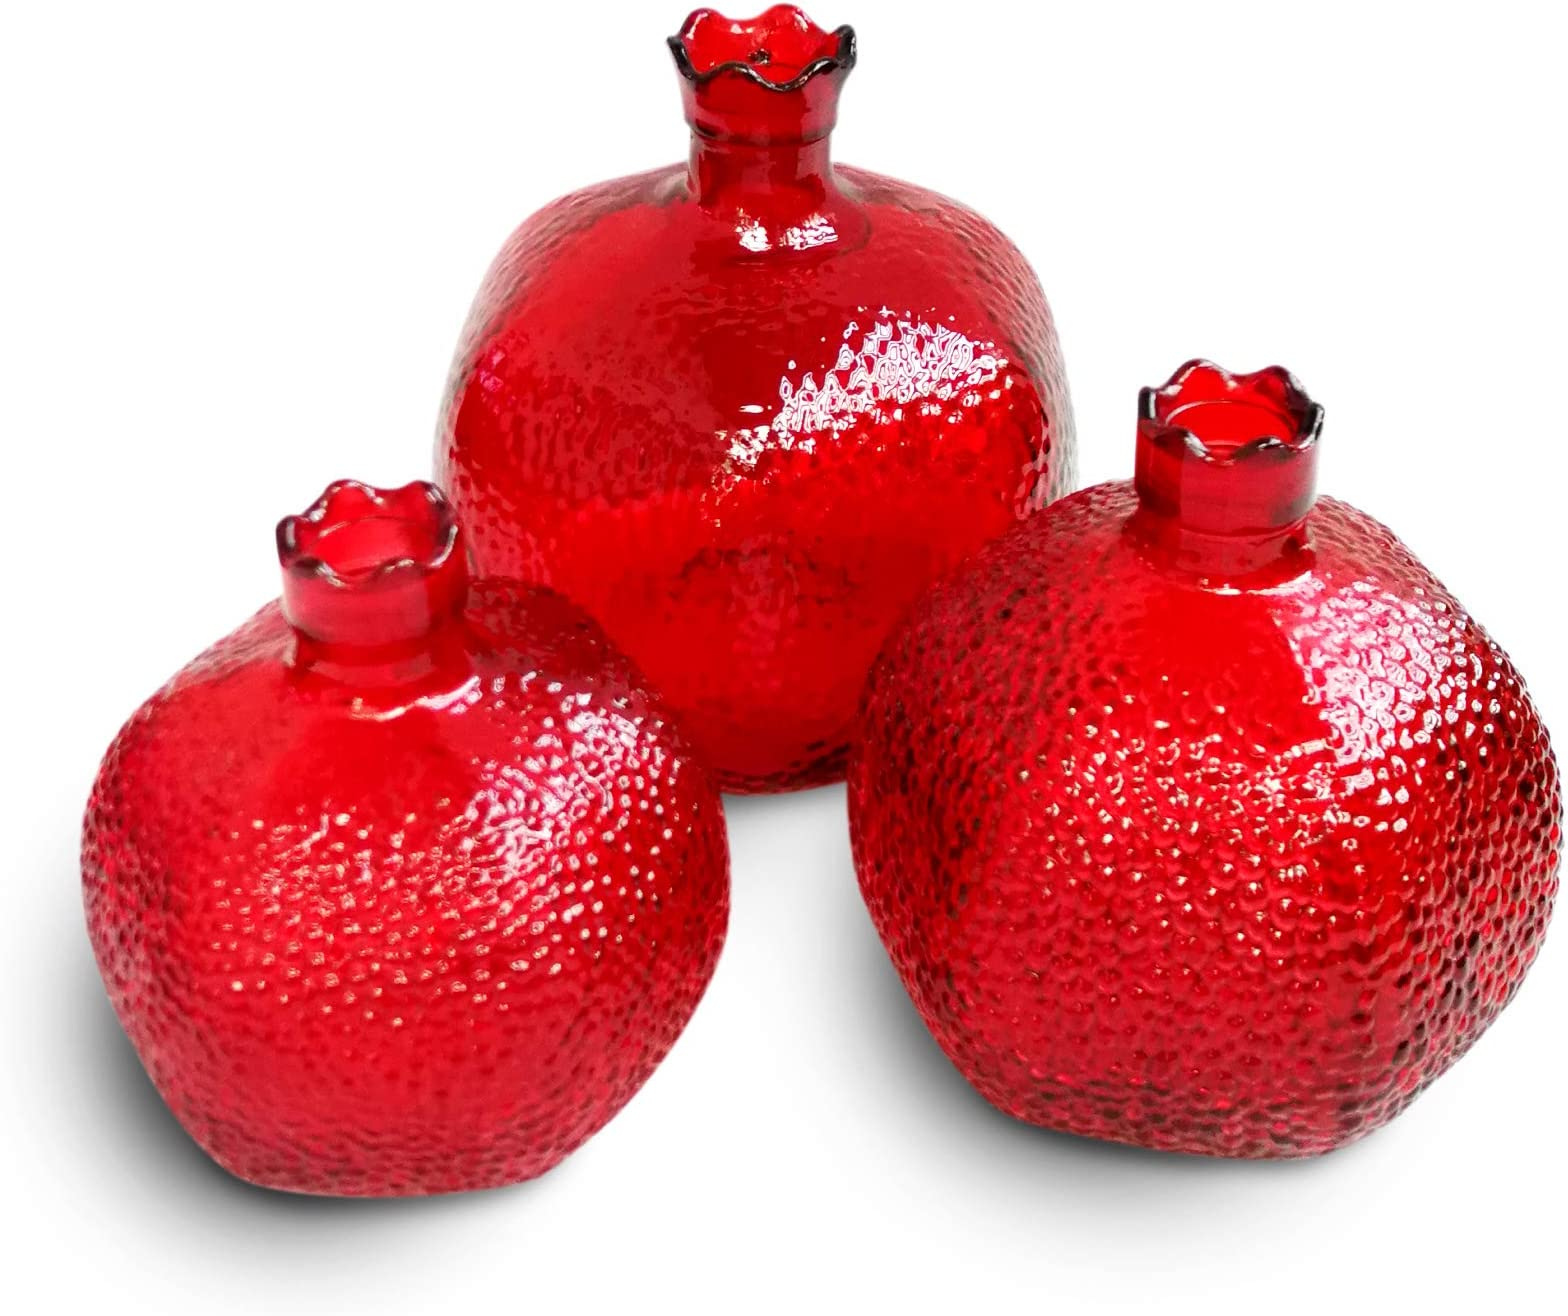 Good Luck gift Abundance symbol Ceramic Fruit Christmas Decor prosperity gift decoration rustic Woodland Decor Red Pomegranate ornament